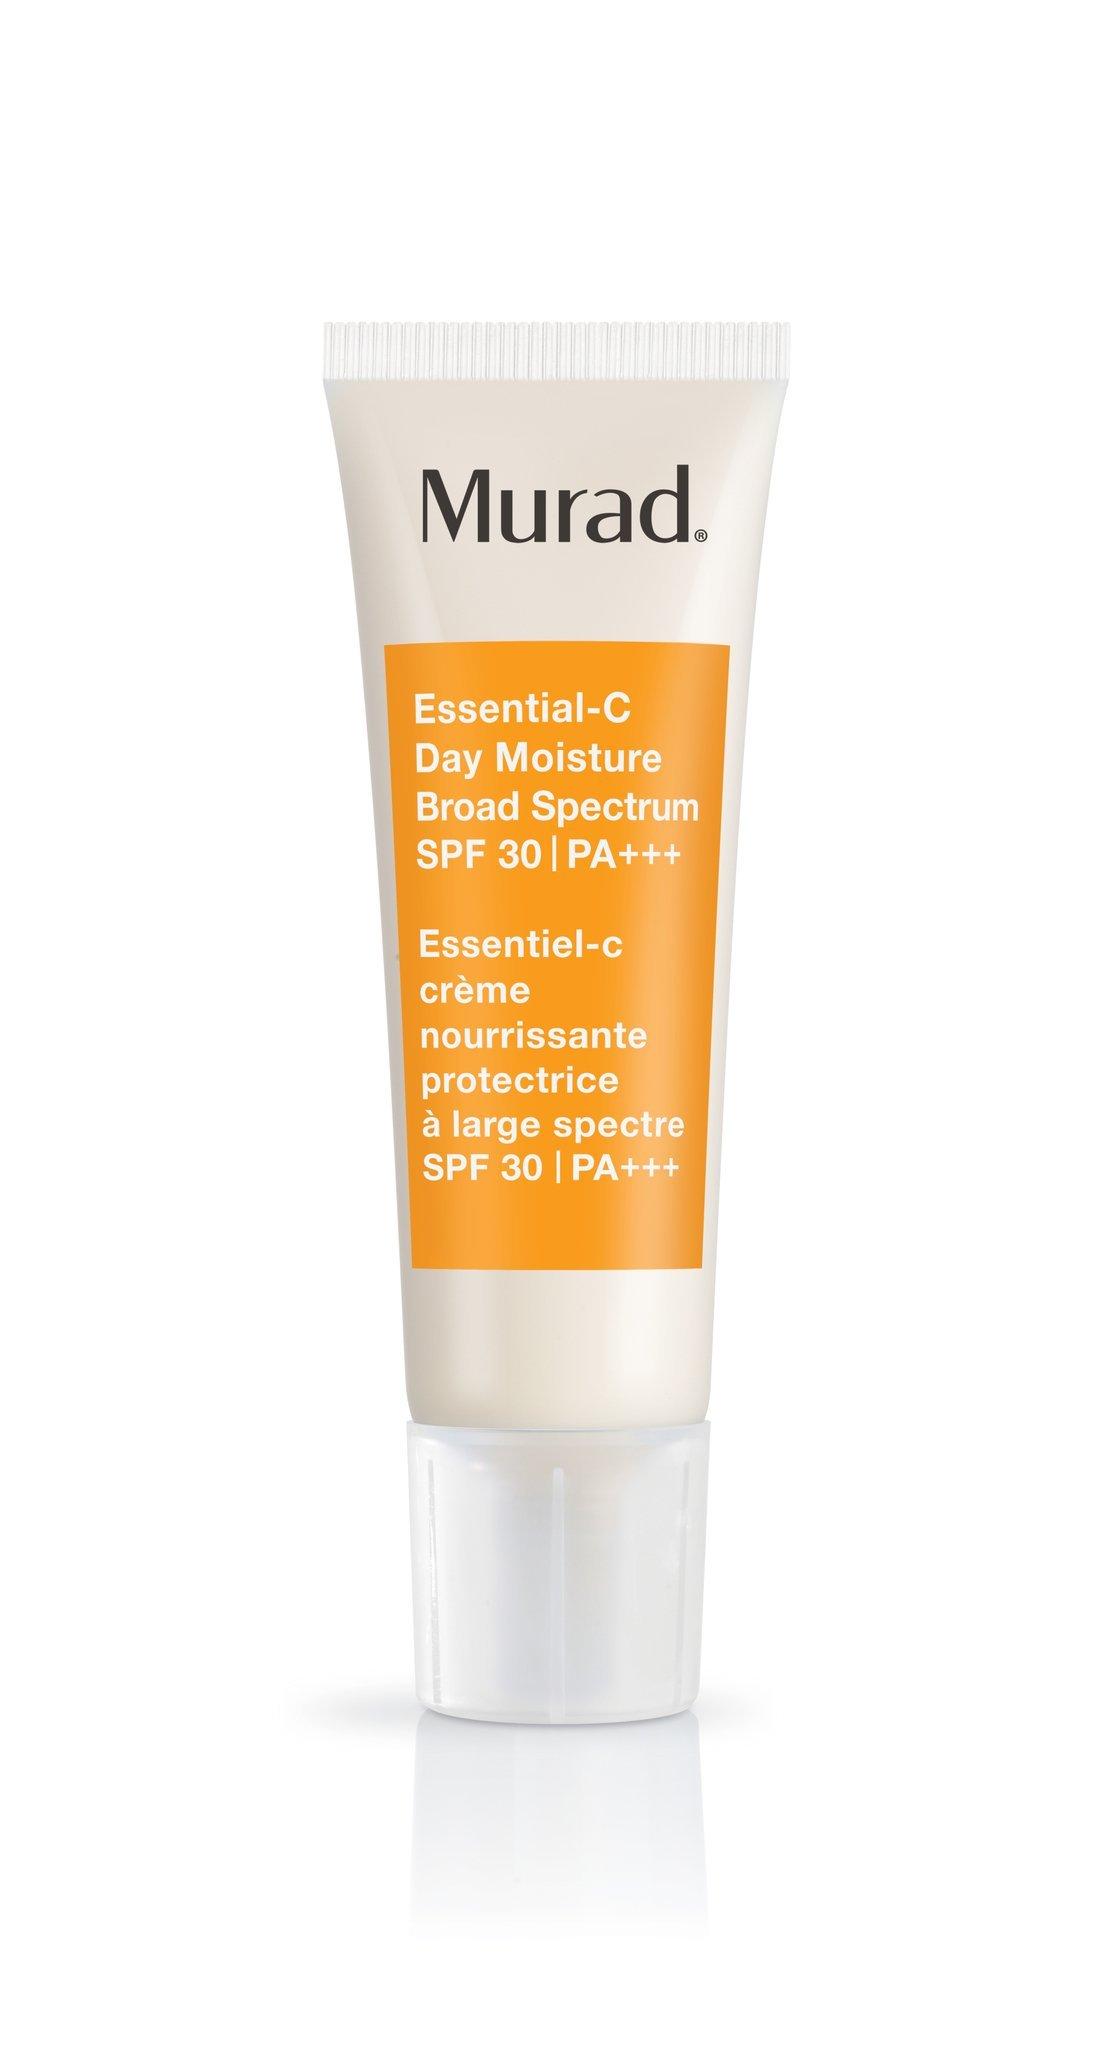 Murad Essential-C Day Moisture Broad Spectrum SPF 30, 1.7 Ounce